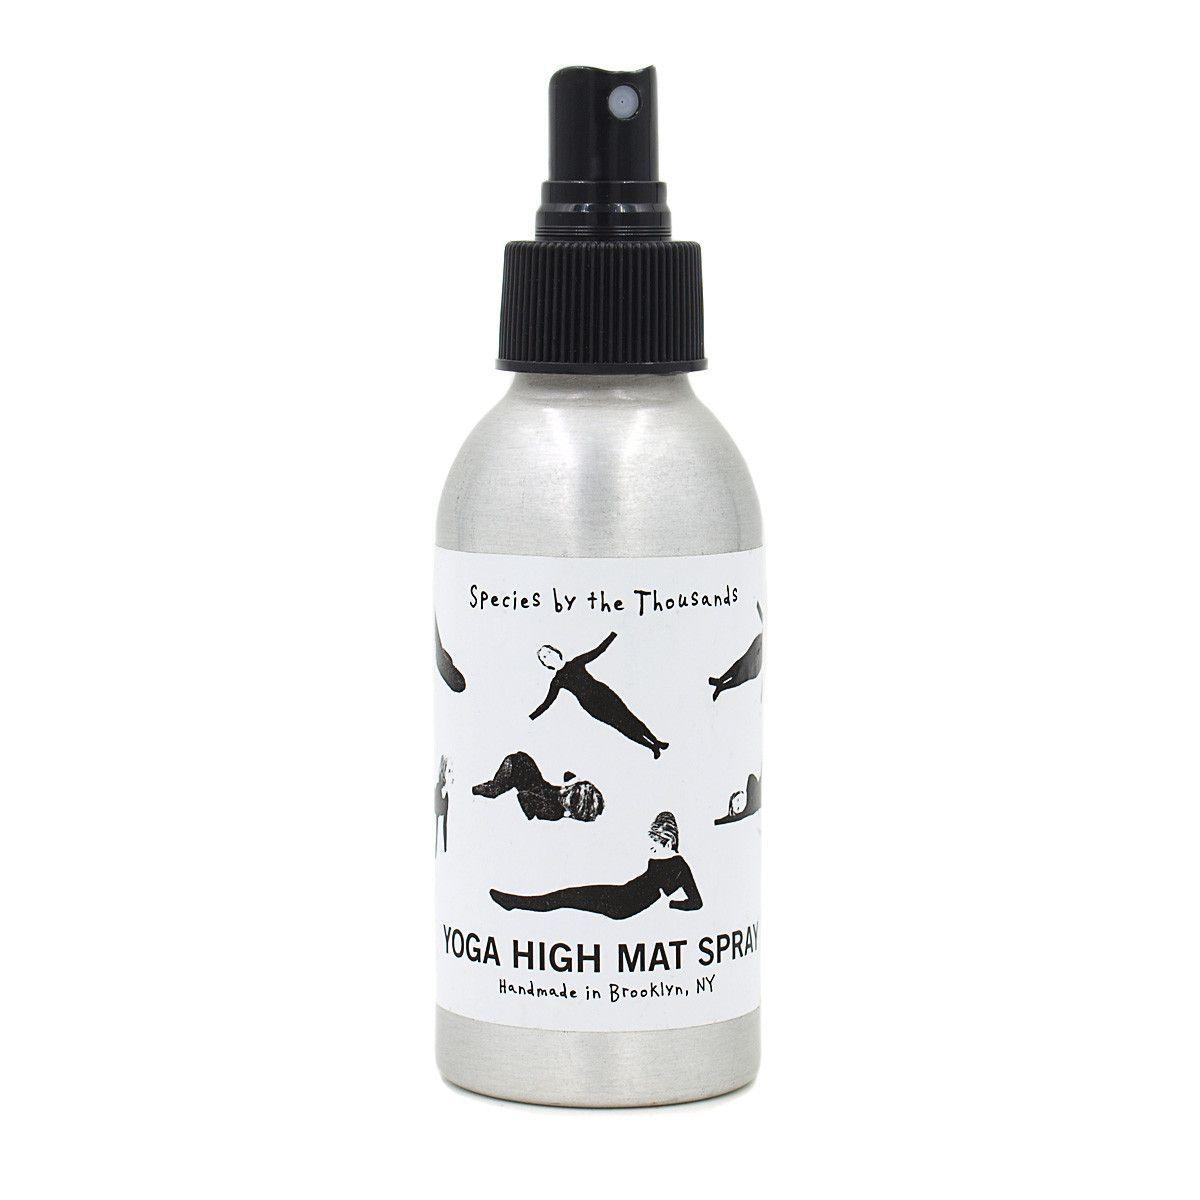 Yoga High Mat Spray Yoga mat spray, Amber glass bottles